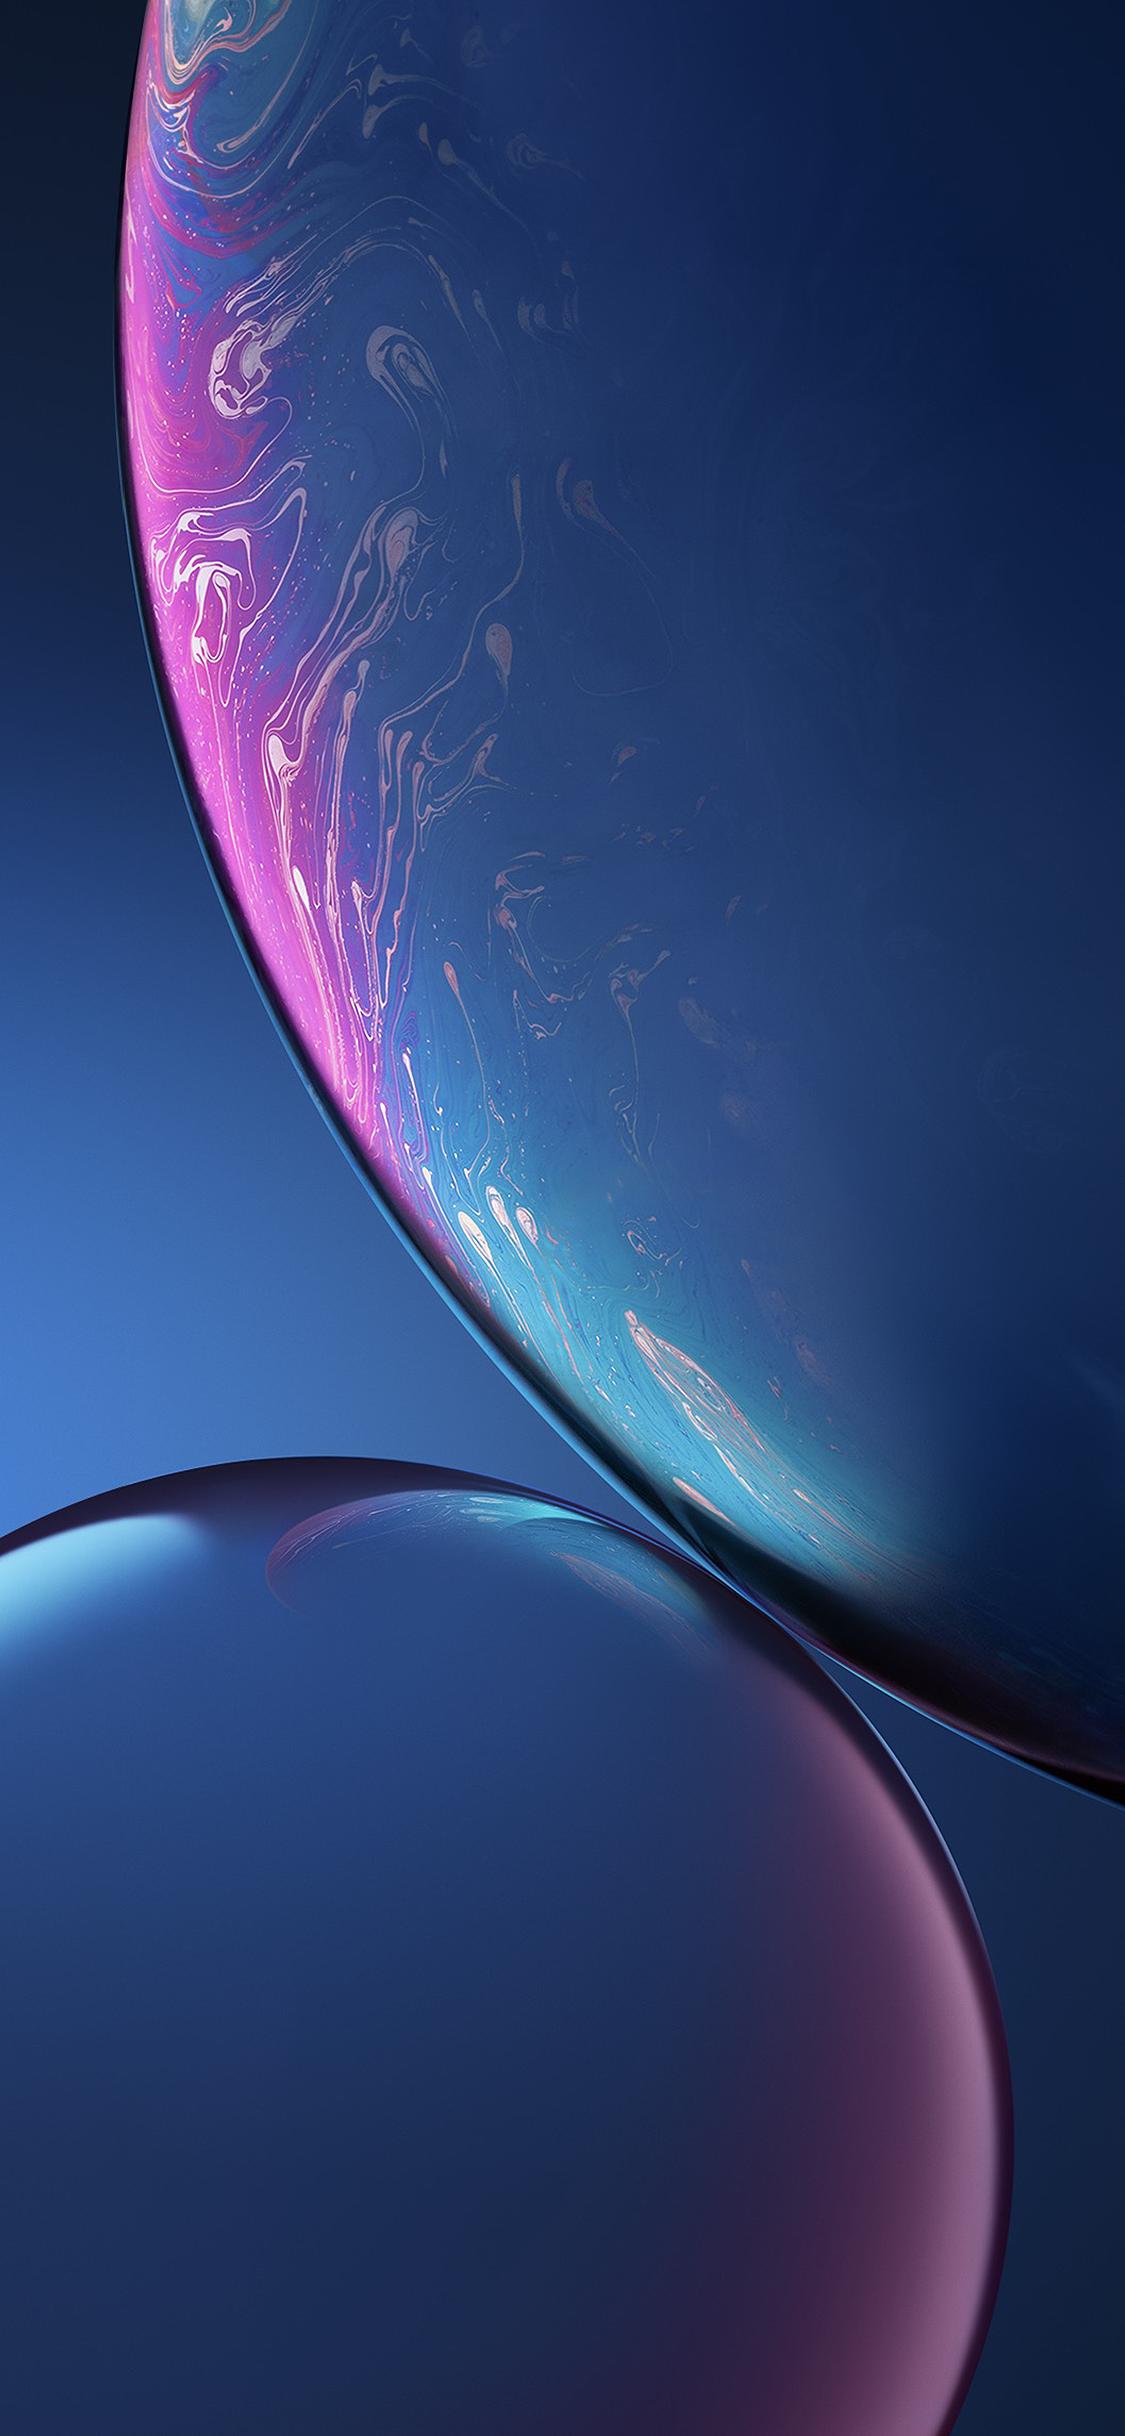 iPhone XR Blue Bubbles Wallpaper